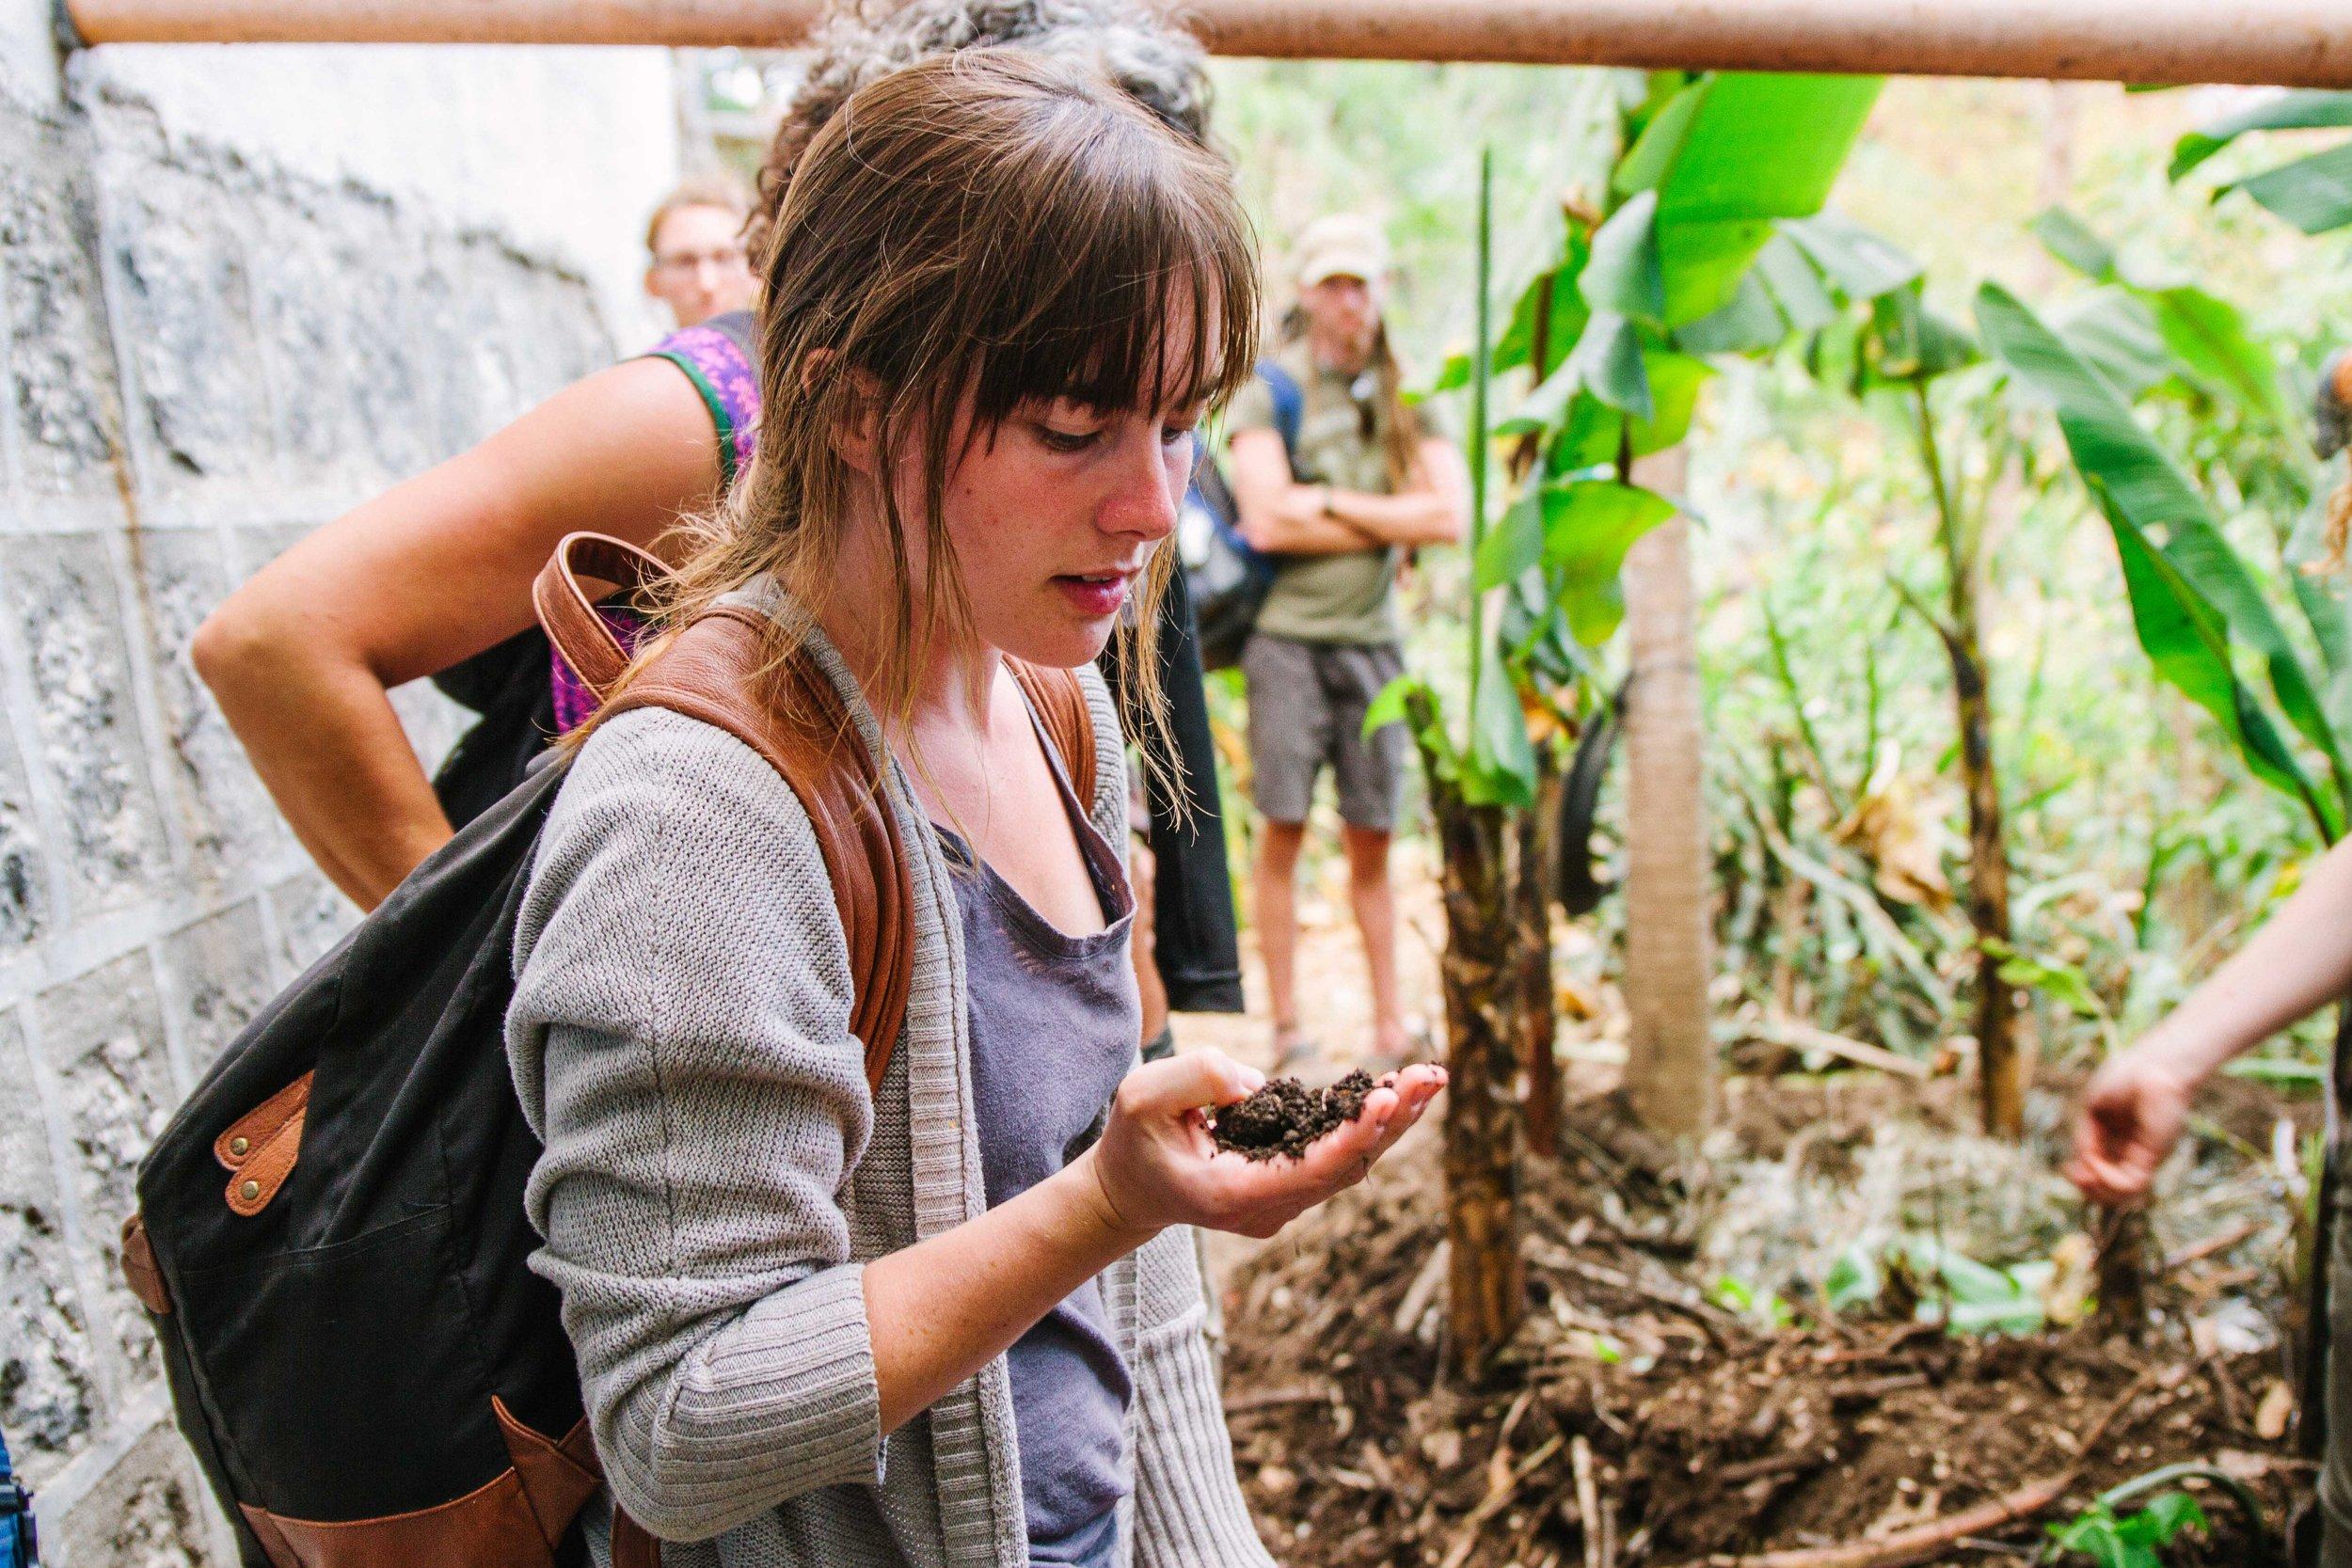 Permaculture, Atitlan Organics, Farm Tour, Permaculture Immersion, Things to do, activities, Bambu Guest House, Tzununa, Lake Atitlan, Guatemala, Central America